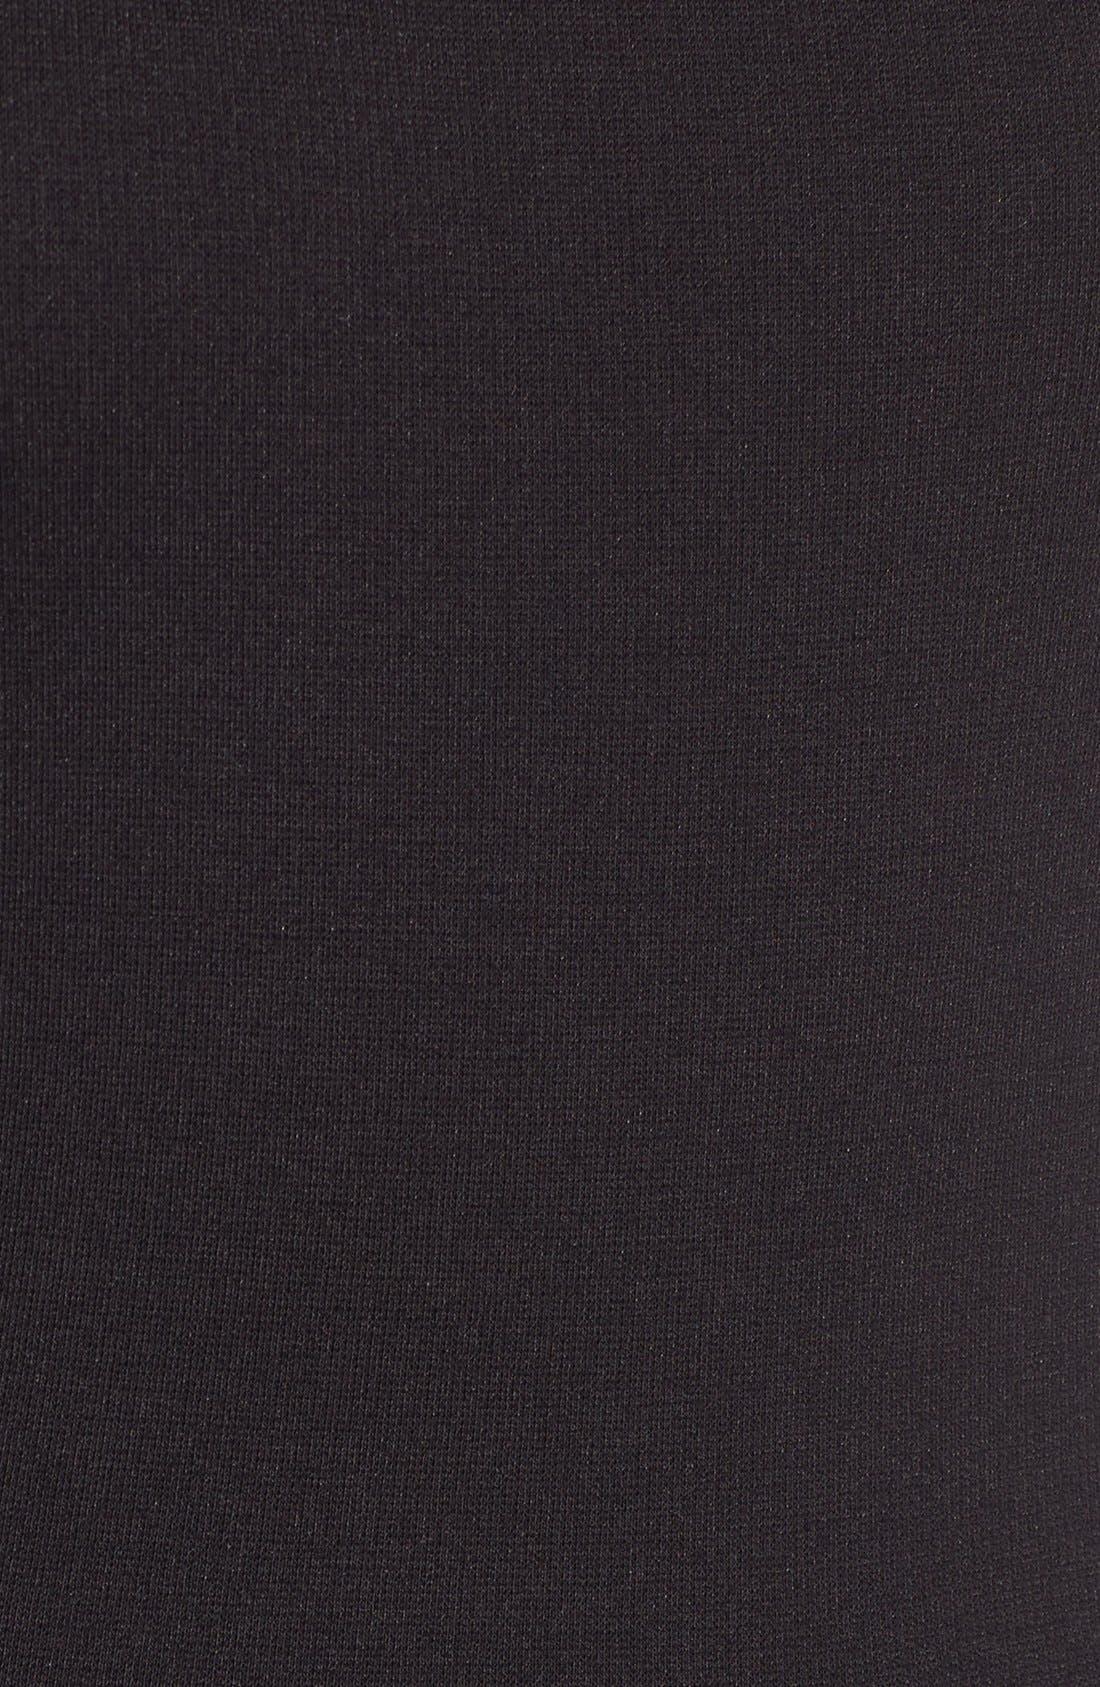 Stretch Knit Midi Dress,                             Alternate thumbnail 49, color,